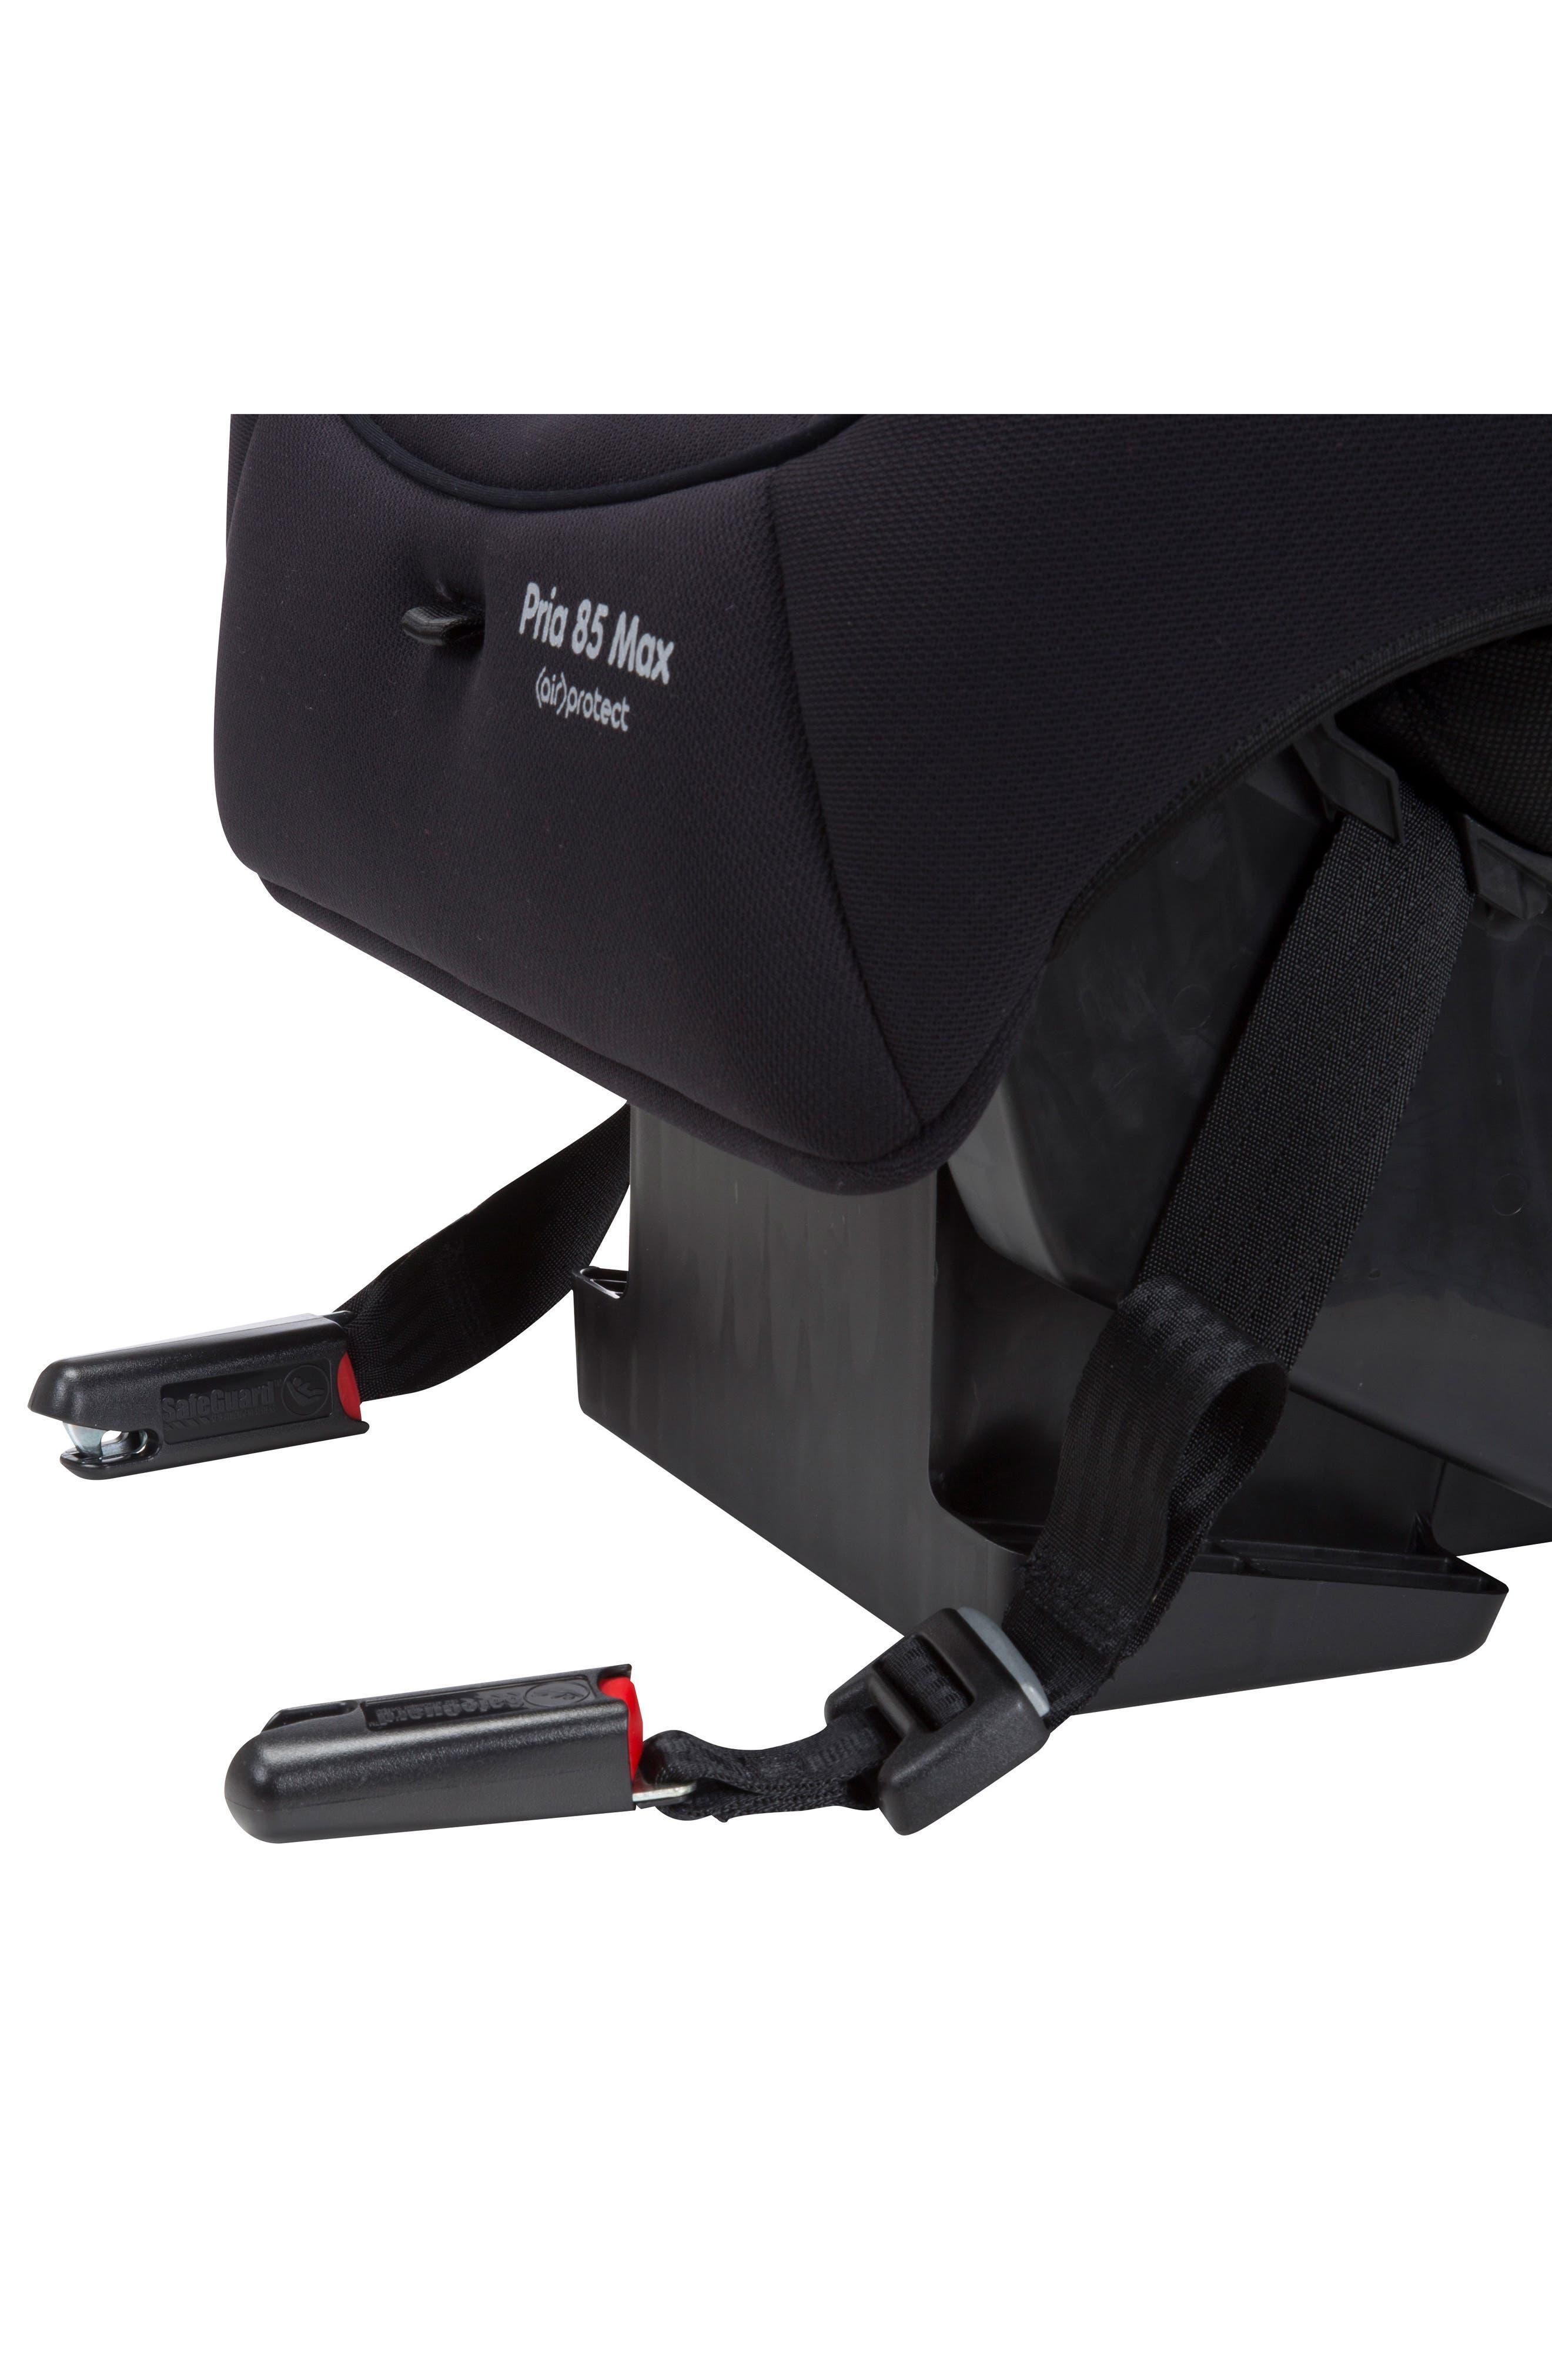 Pria<sup>™</sup> 85 Max Convertible Car Seat,                             Alternate thumbnail 4, color,                             NIGHT BLACK